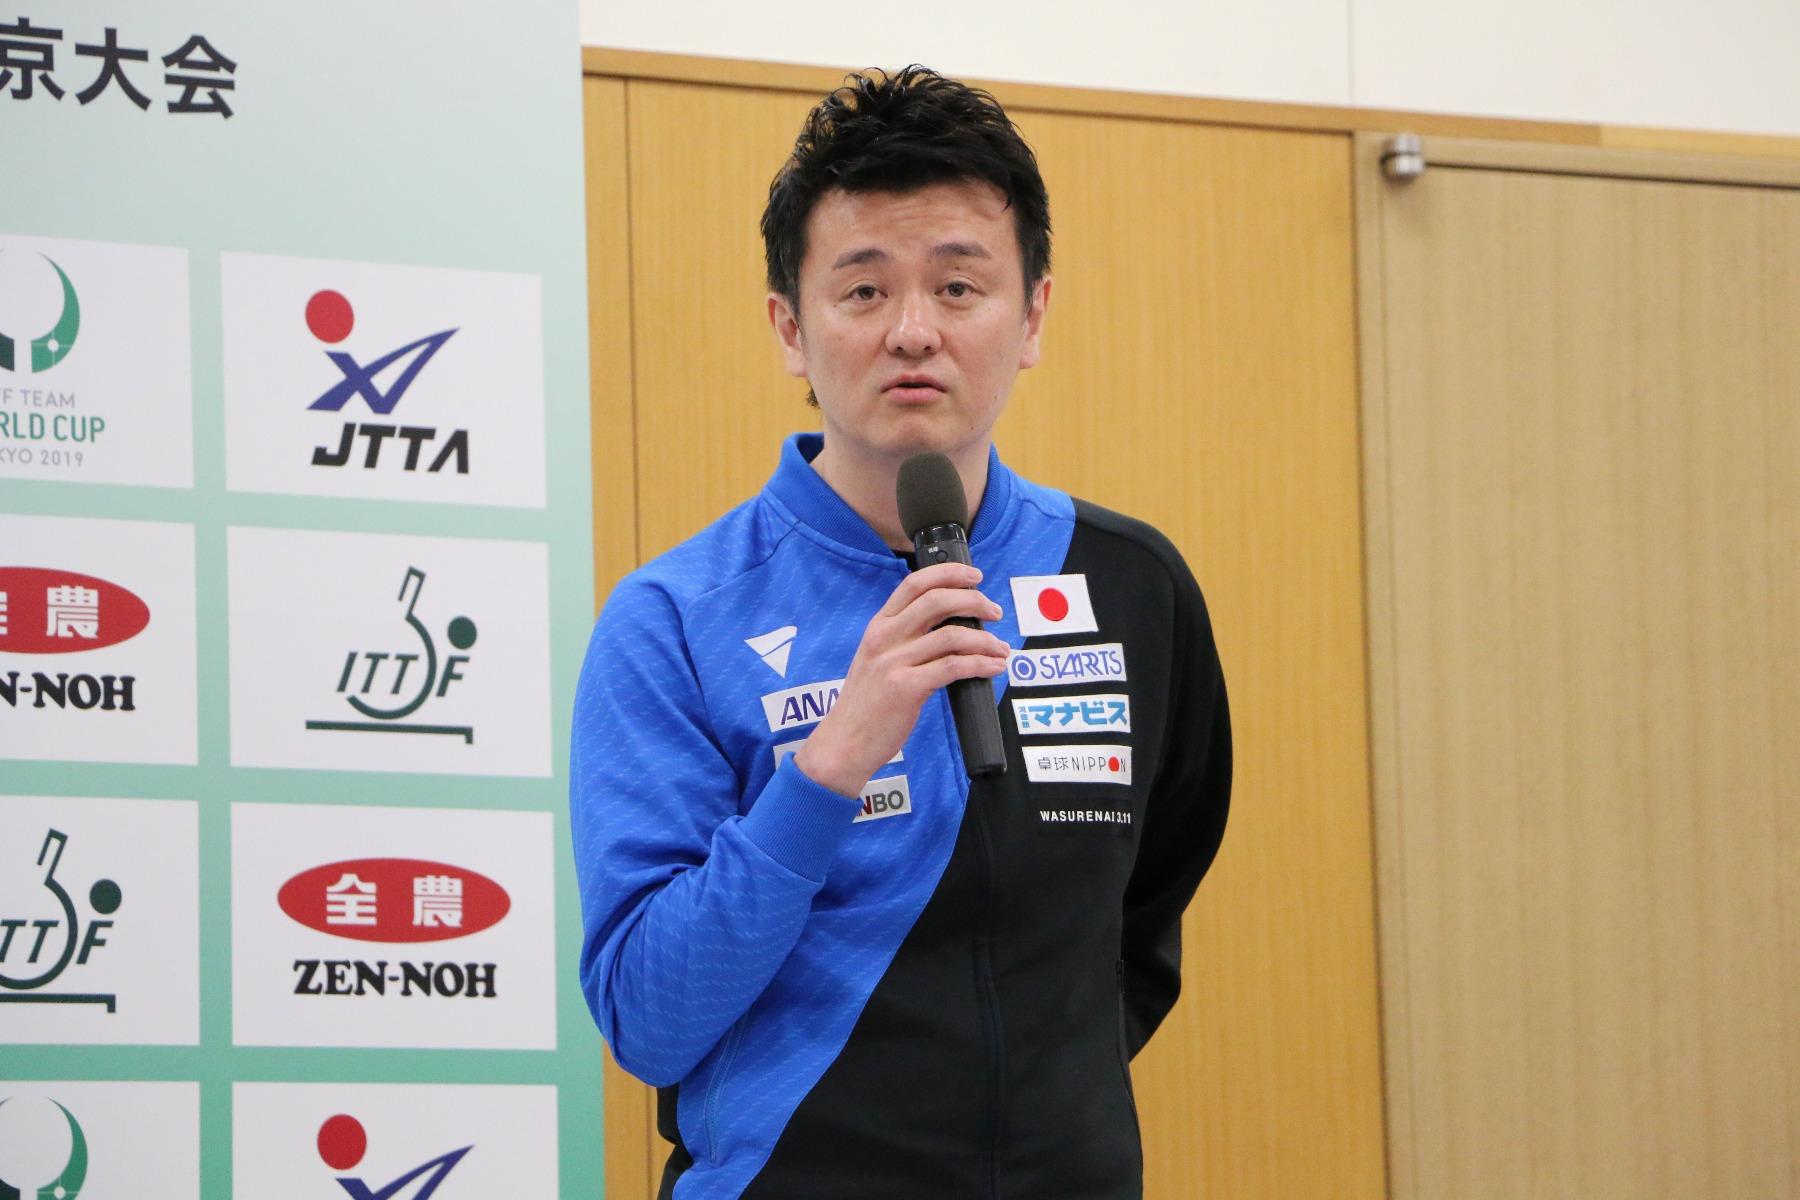 JA全農 チームワールドカップ 東京大会 開催記者発表 会見 倉嶋洋介